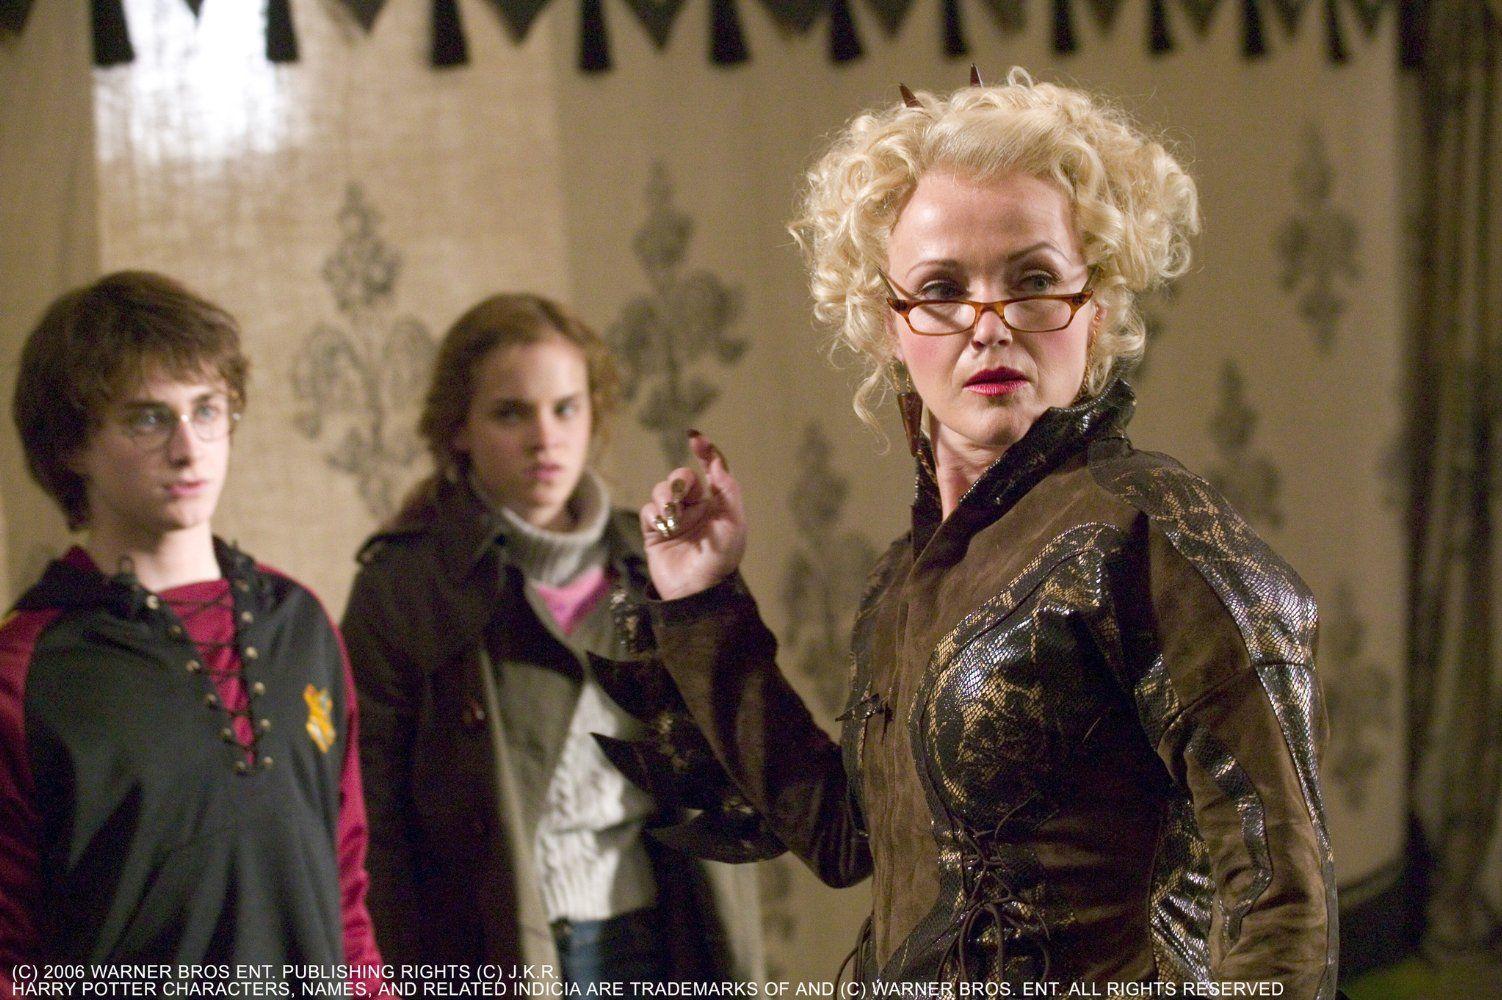 Harry Hermione Rita Kimmkorn Bruxo